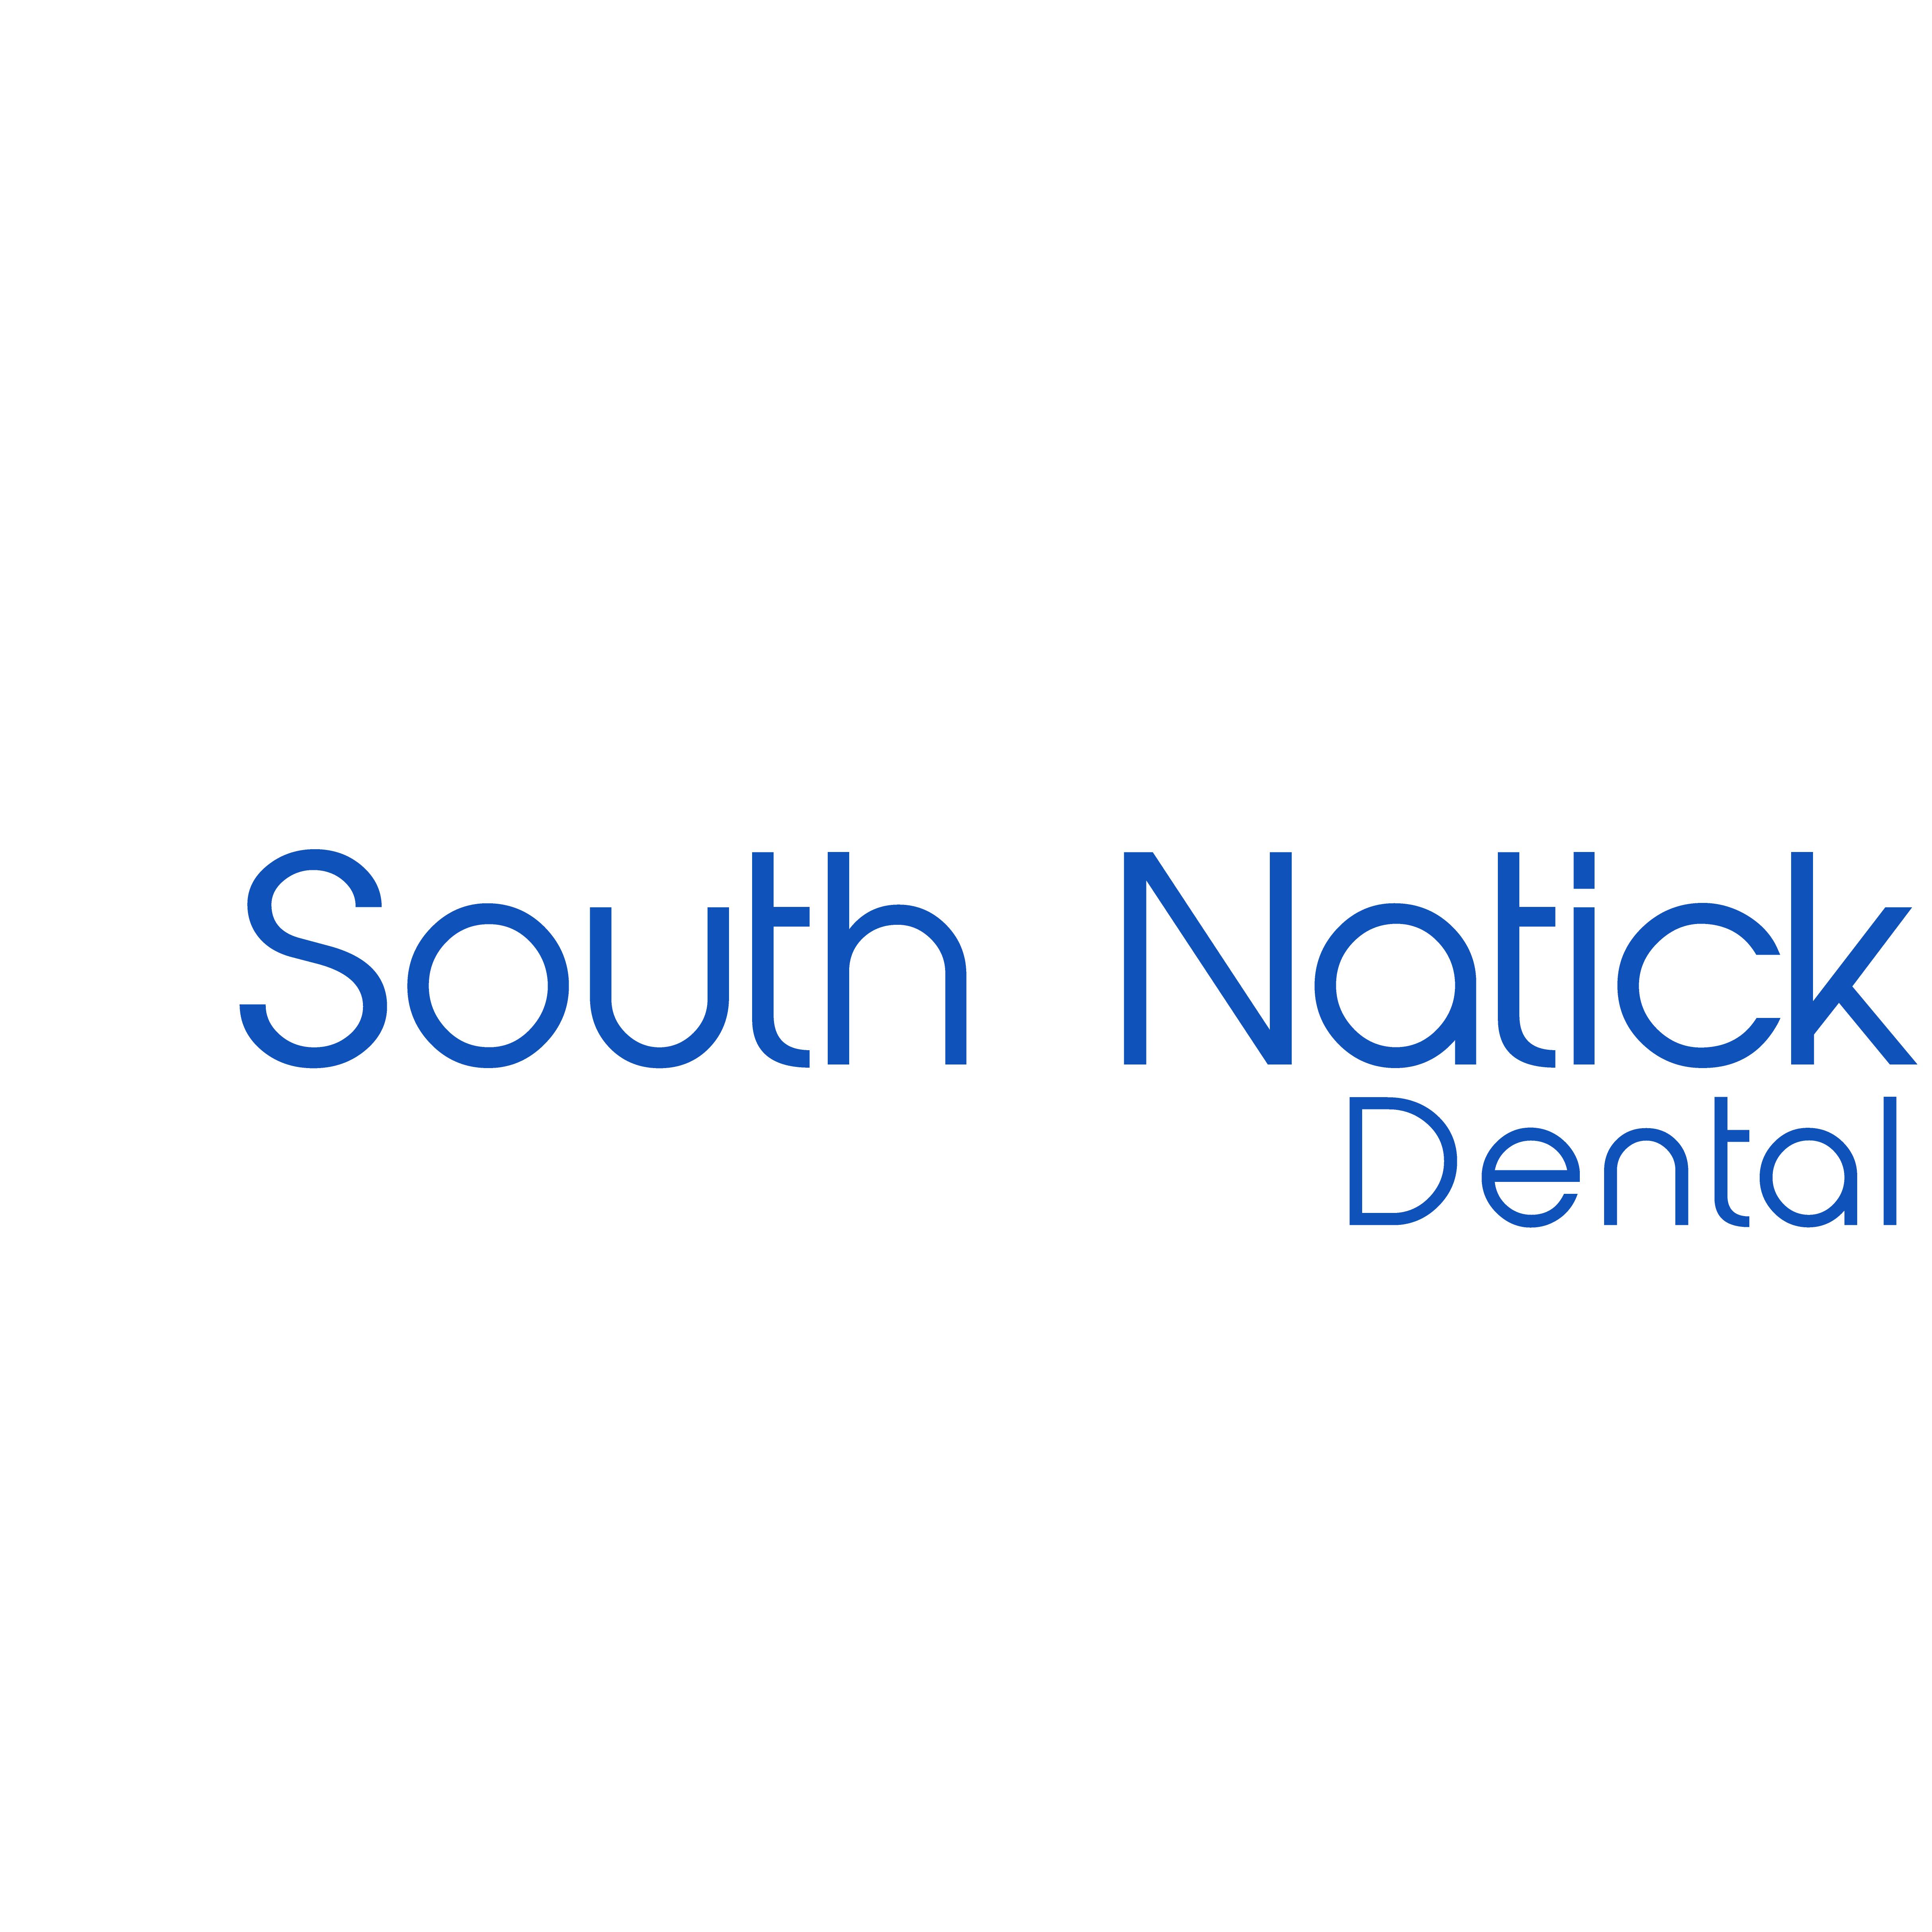 South Natick Dental: Dr. Svetlana Novak - South Natick, MA - Dentists & Dental Services